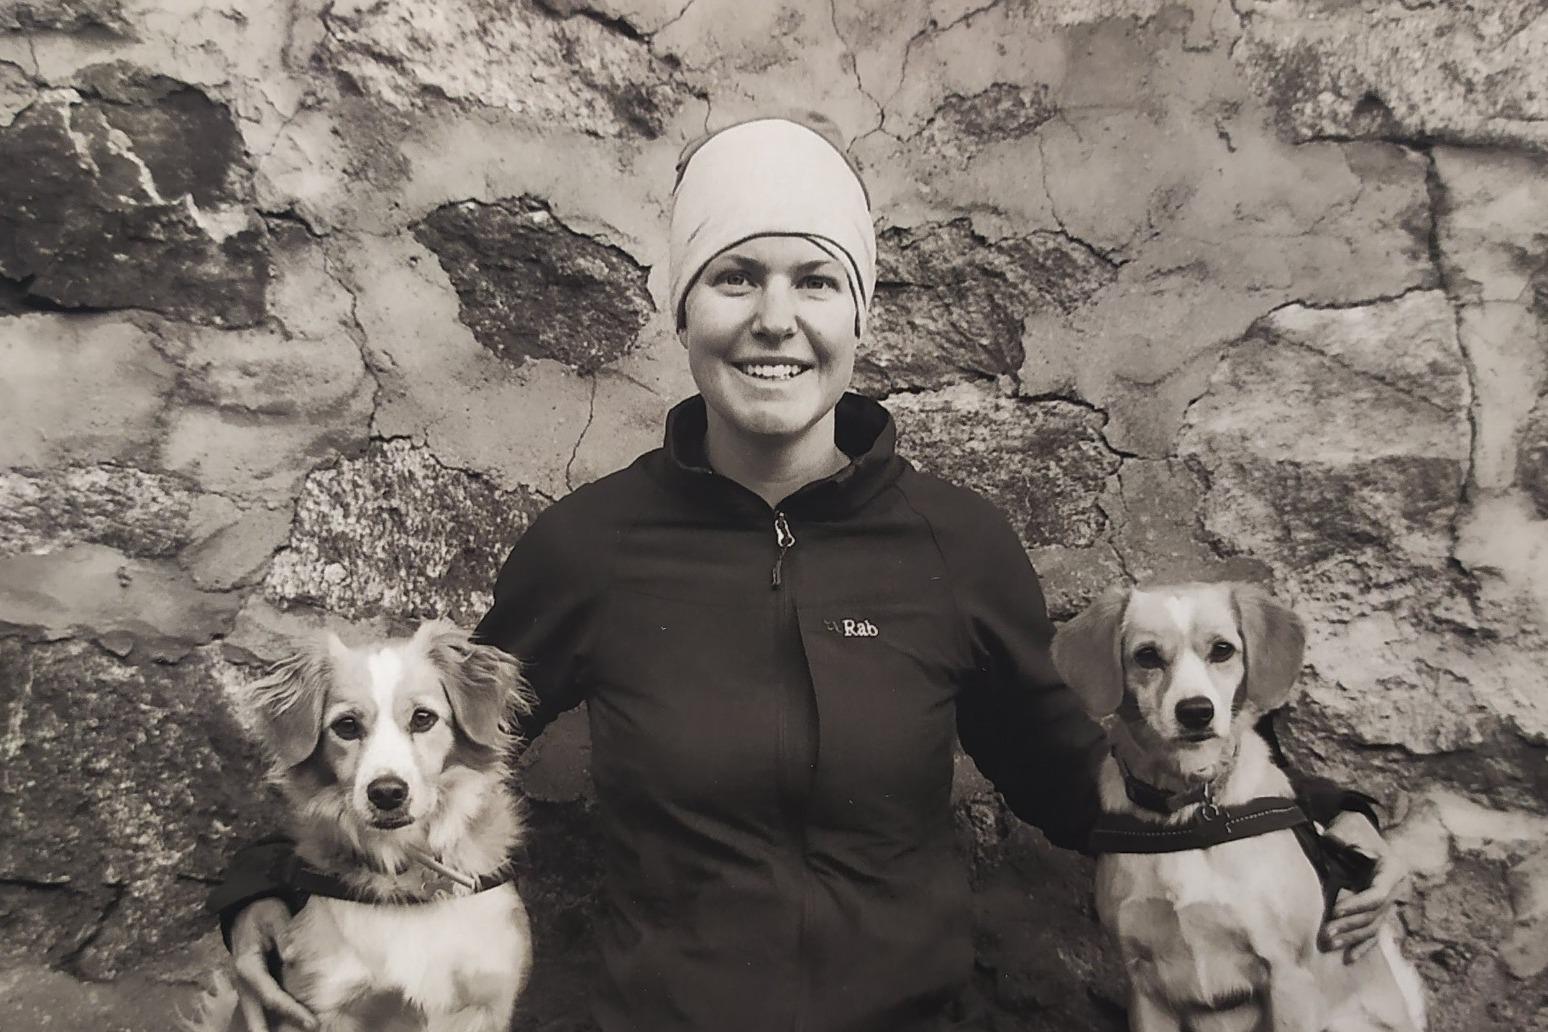 Partner of British hiker missing in Pyrenees thanks 'hero' search teams